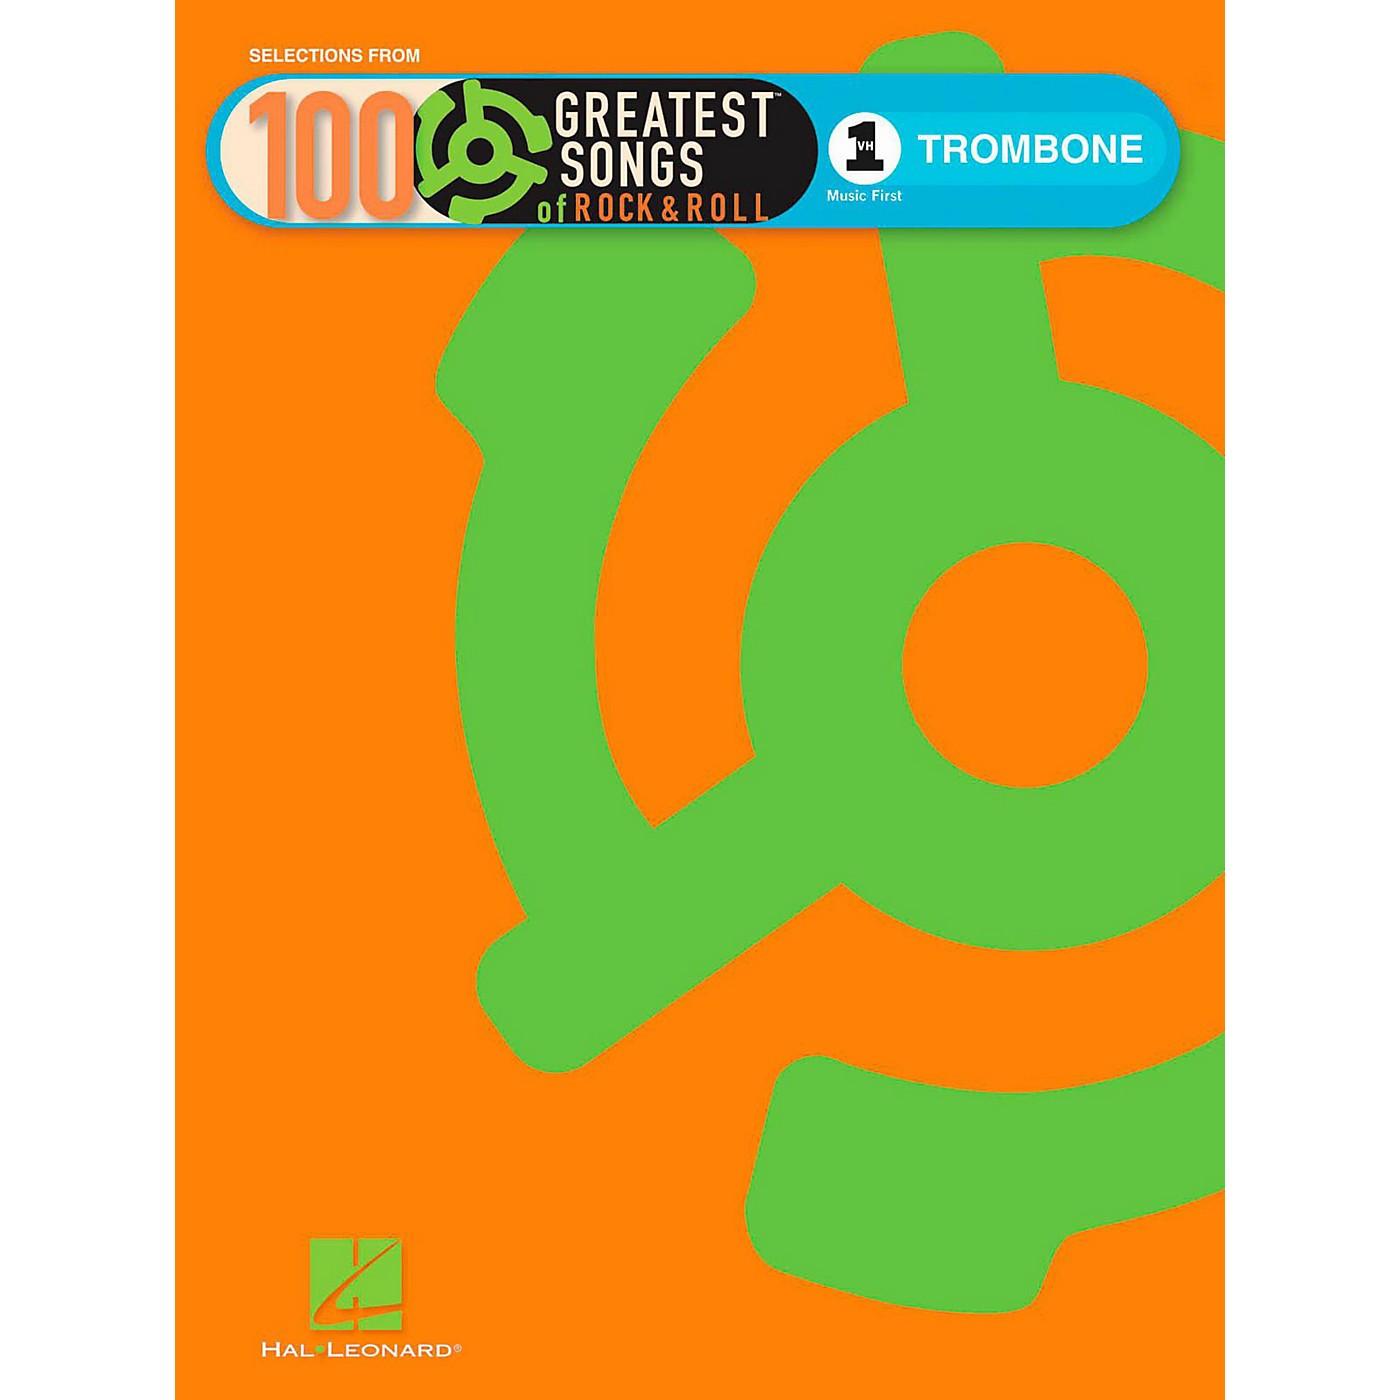 Hal Leonard VH1's 100 Greatest Songs Of Rock & Roll Trombone (Book Only) thumbnail